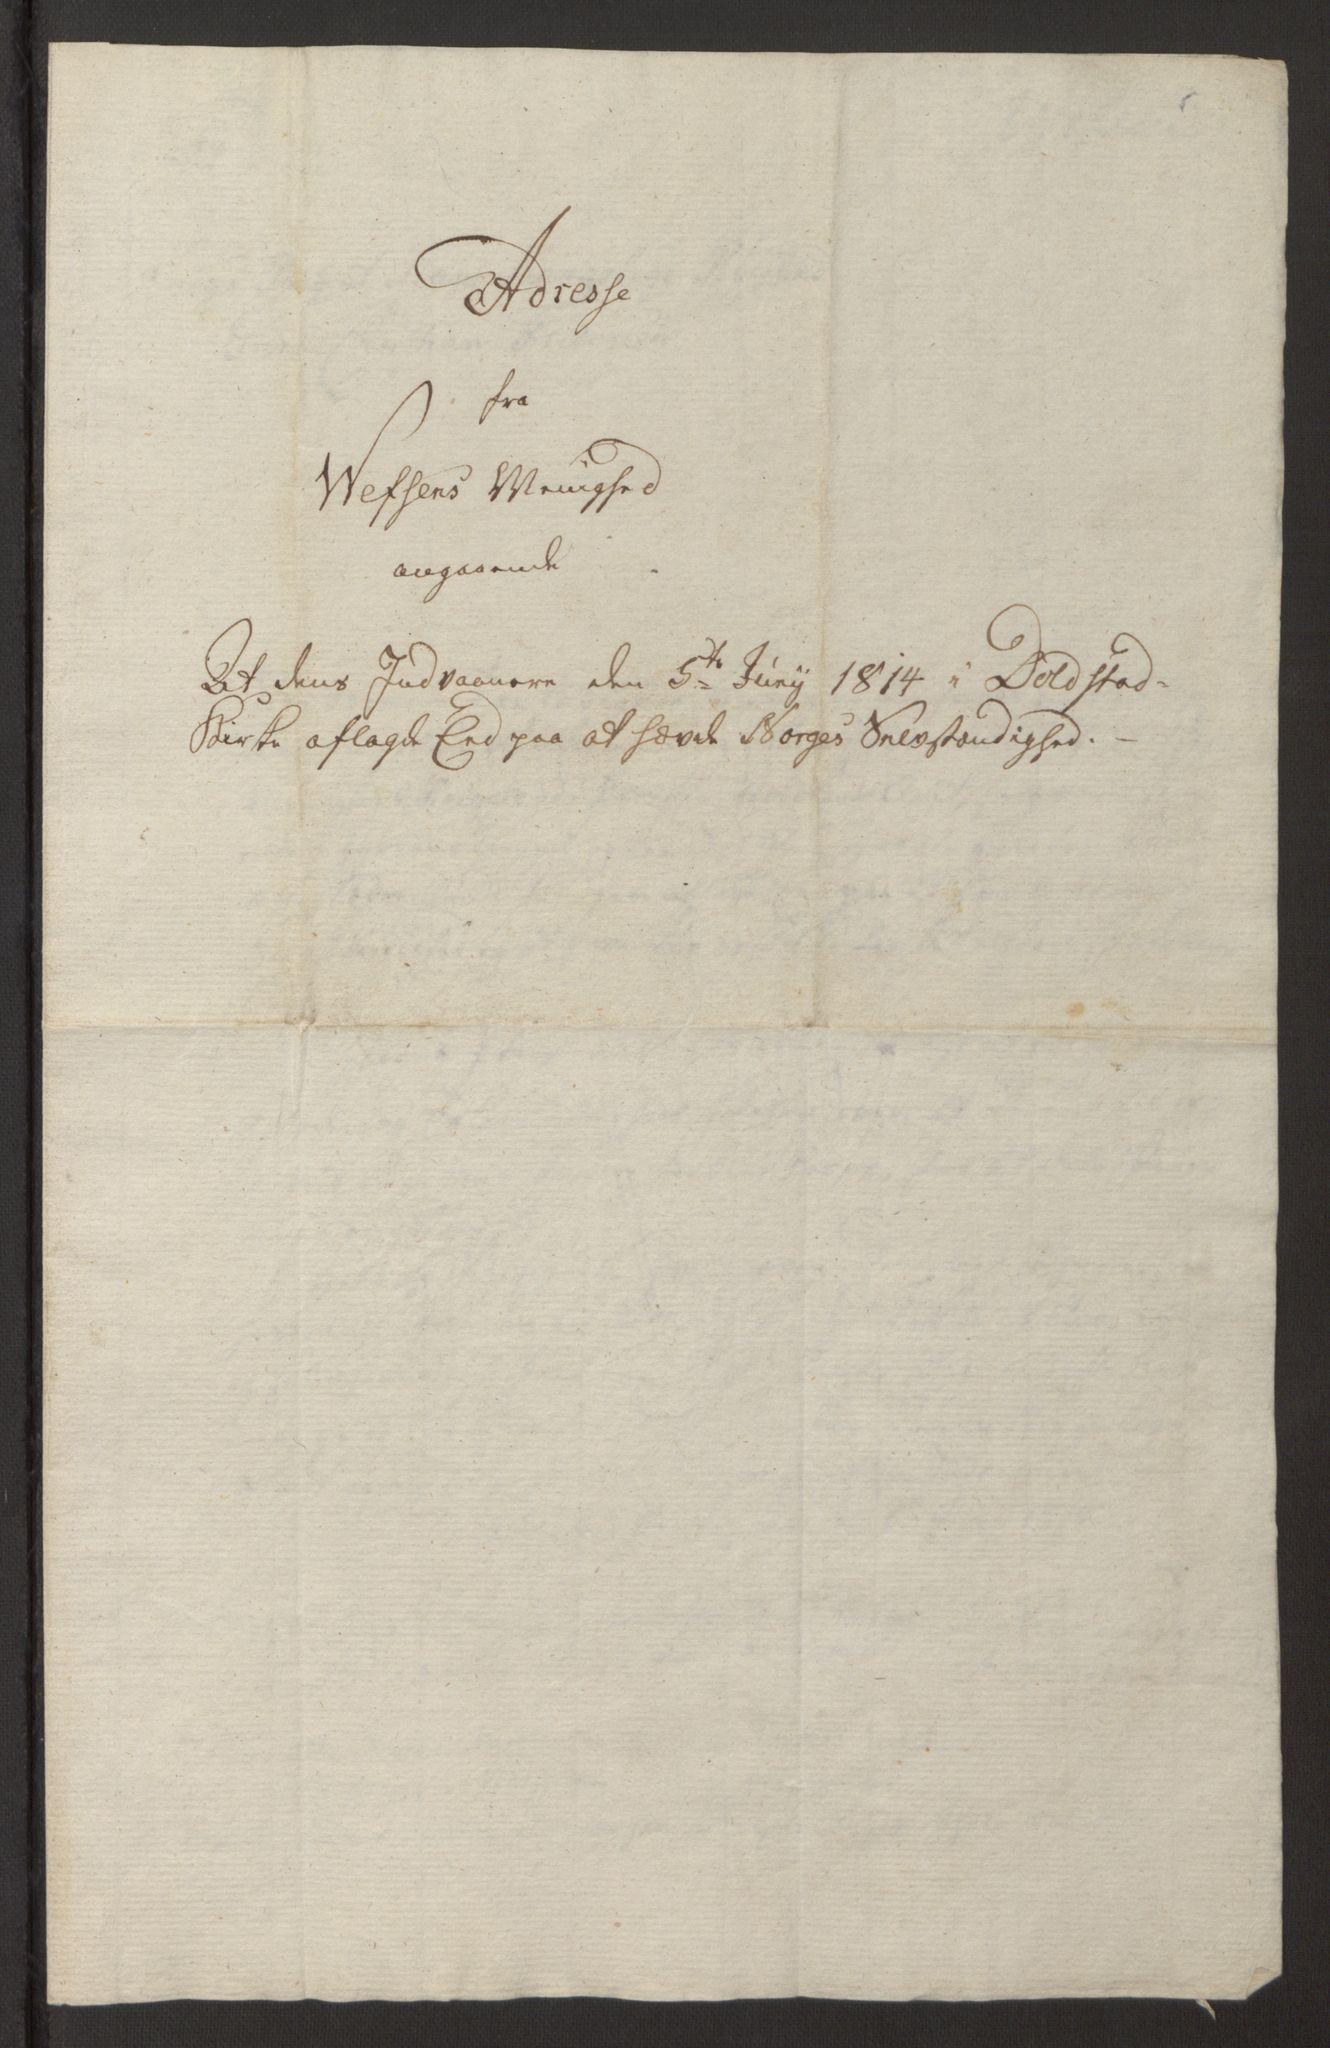 SAT, Nordland amt/fylke*, 1814, s. 44